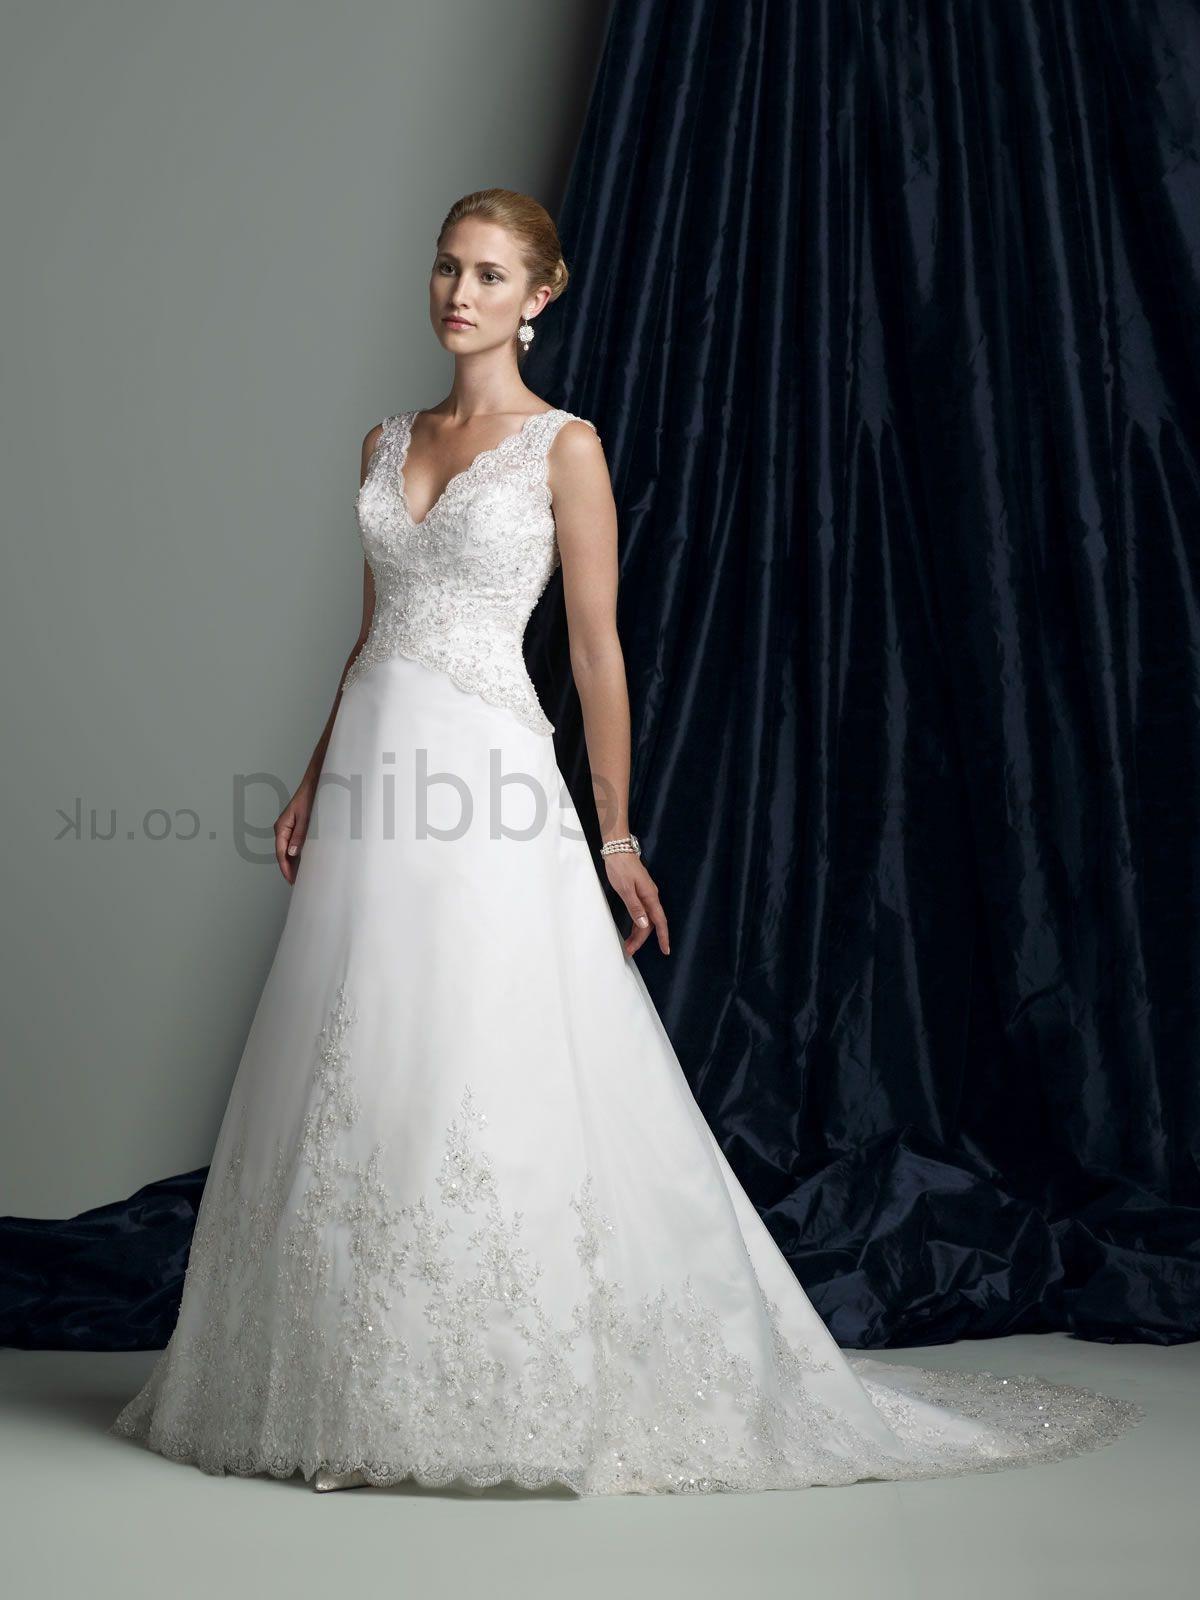 Dress. Organza A-line